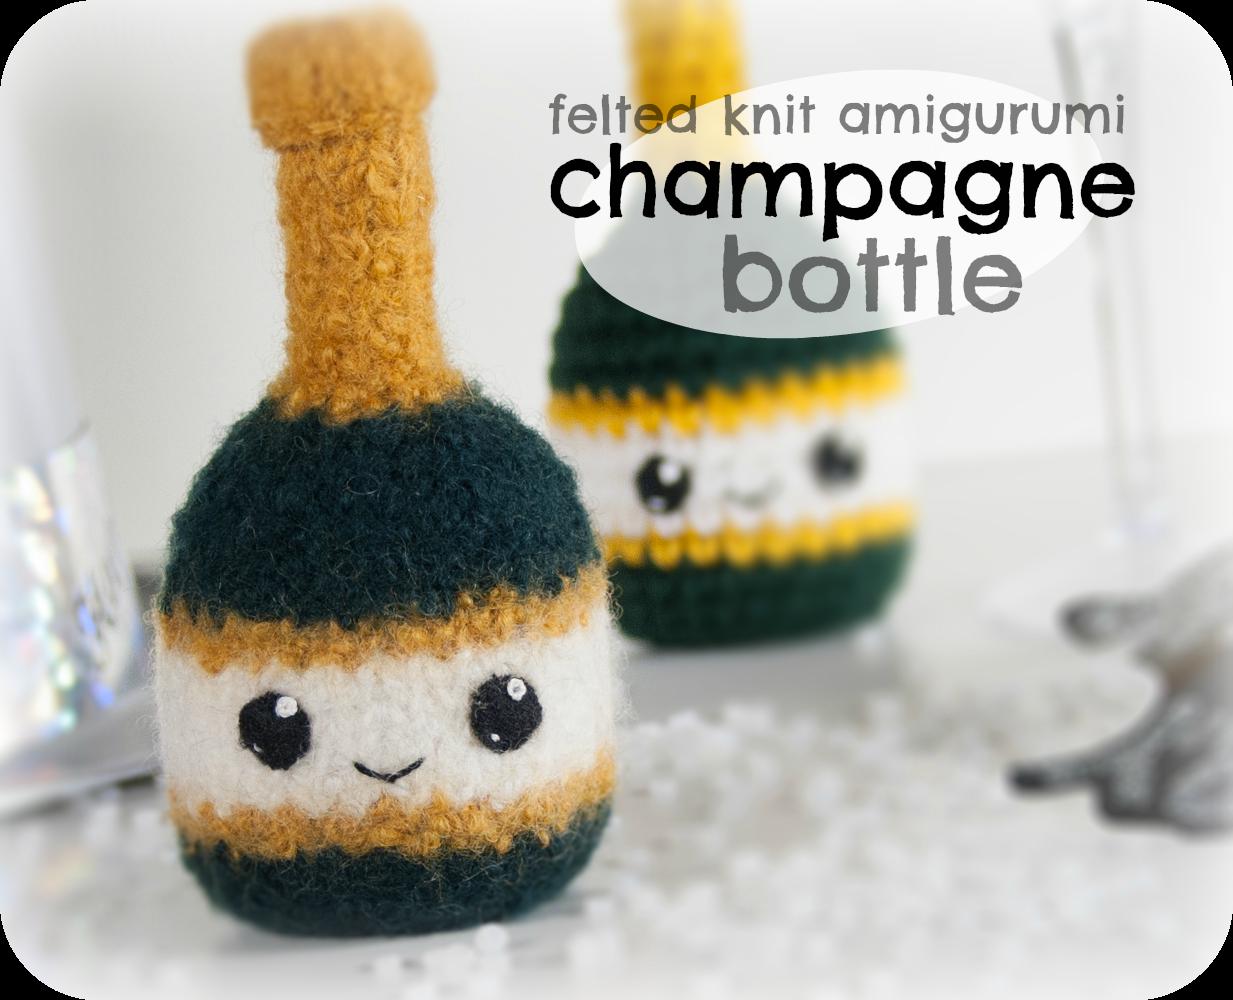 Felted Knit Amigurumi Champagne Bottle CraftyAlien Blog